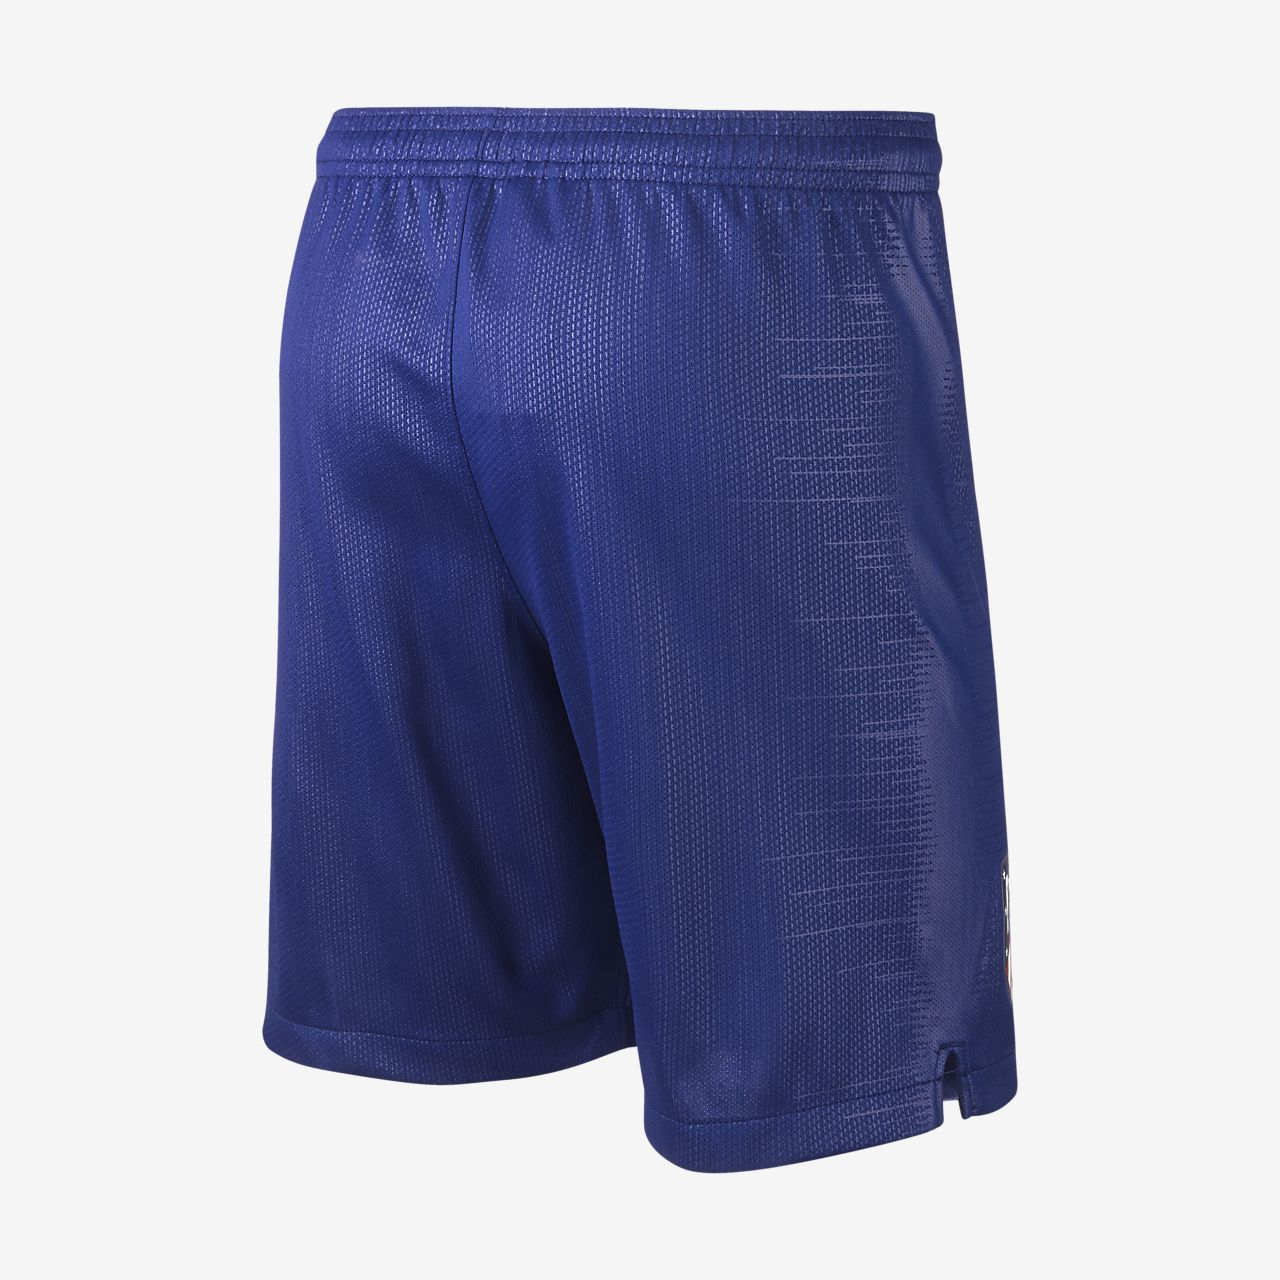 62fbc1ea966e7 ... Shorts de fútbol para niño talla grande 2018 19 Atletico de Madrid  Stadium Home